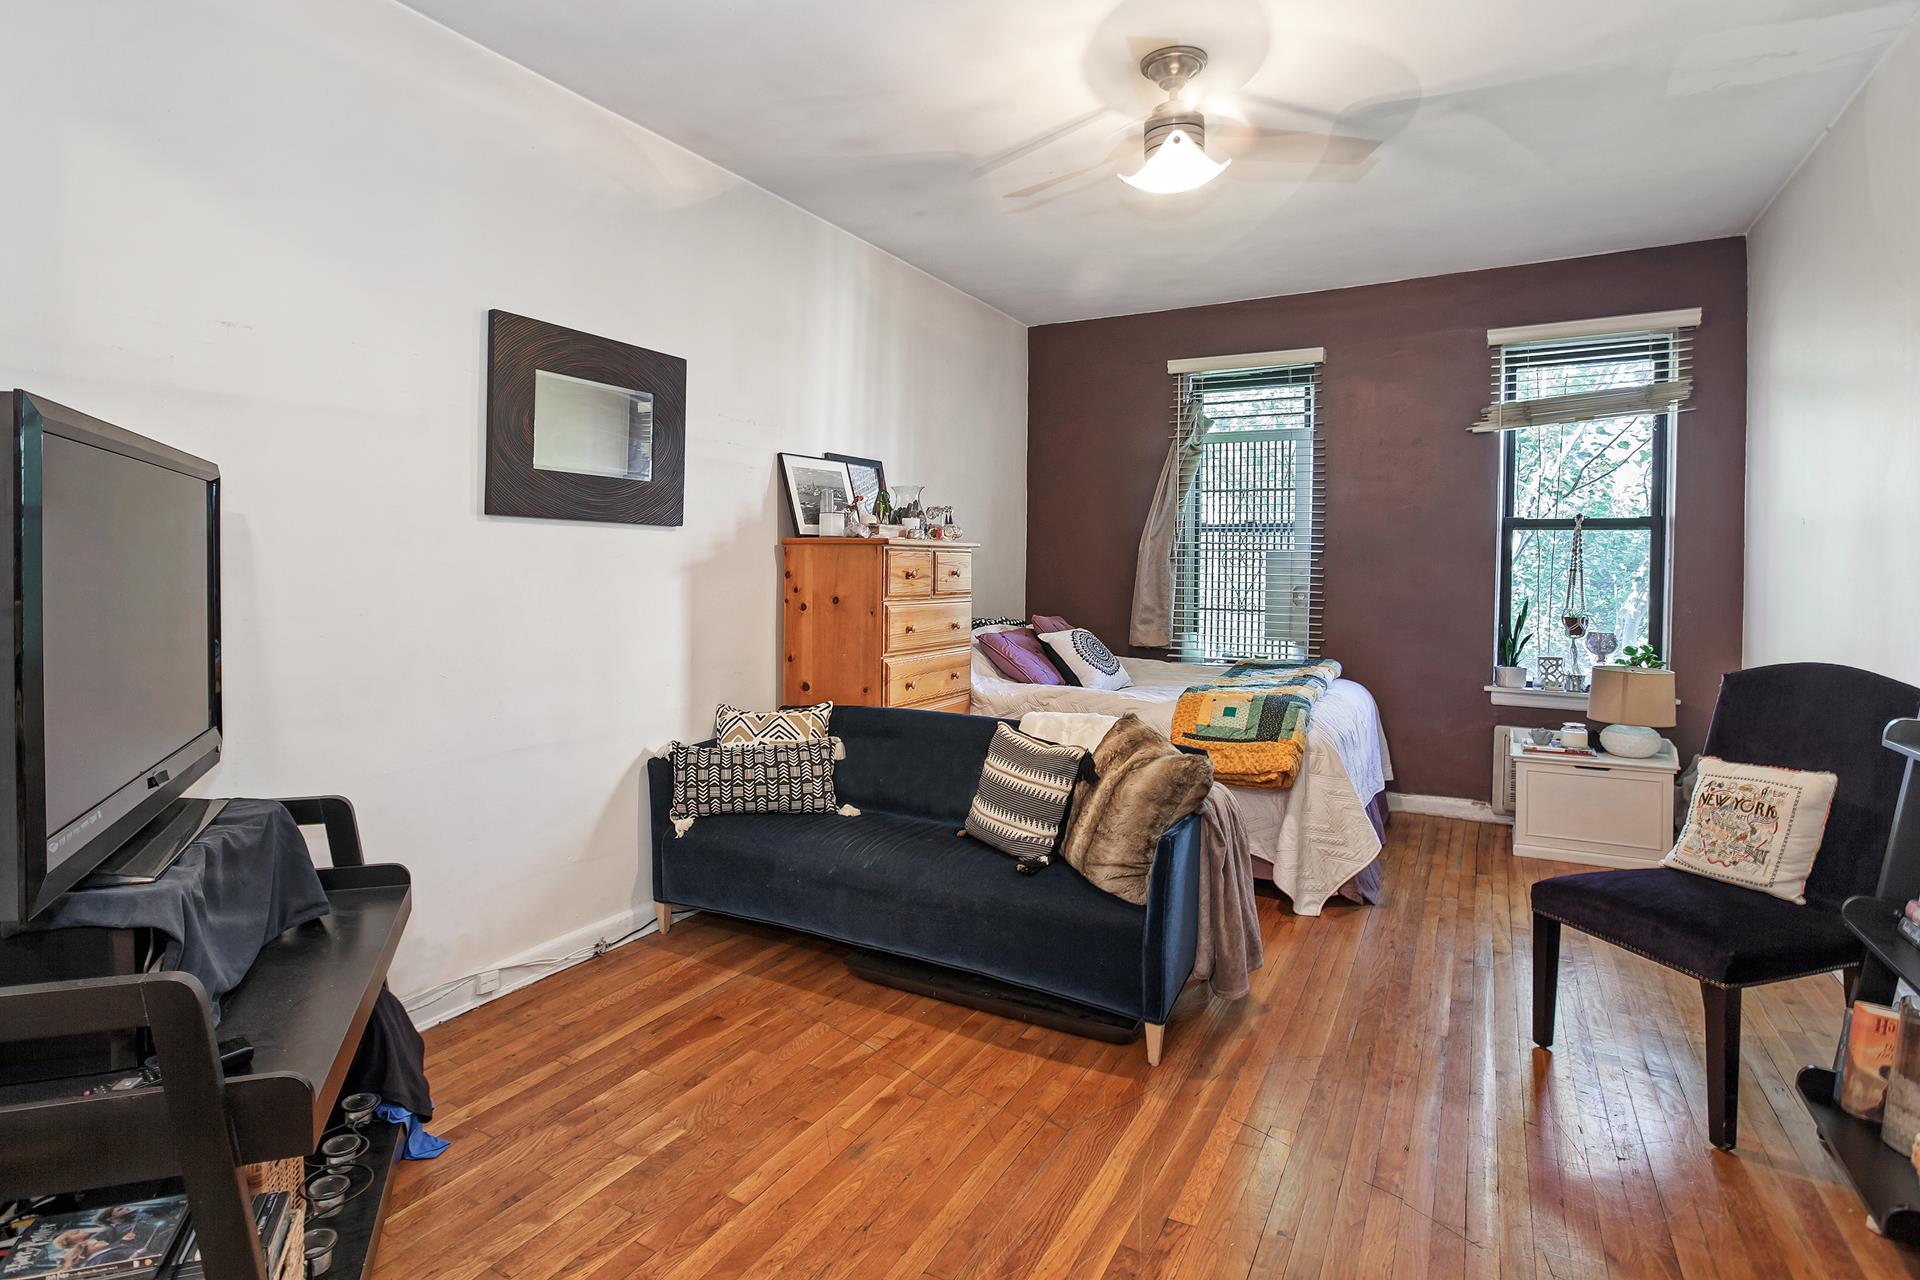 415 East 82nd St, 5B - Upper East Side, New York